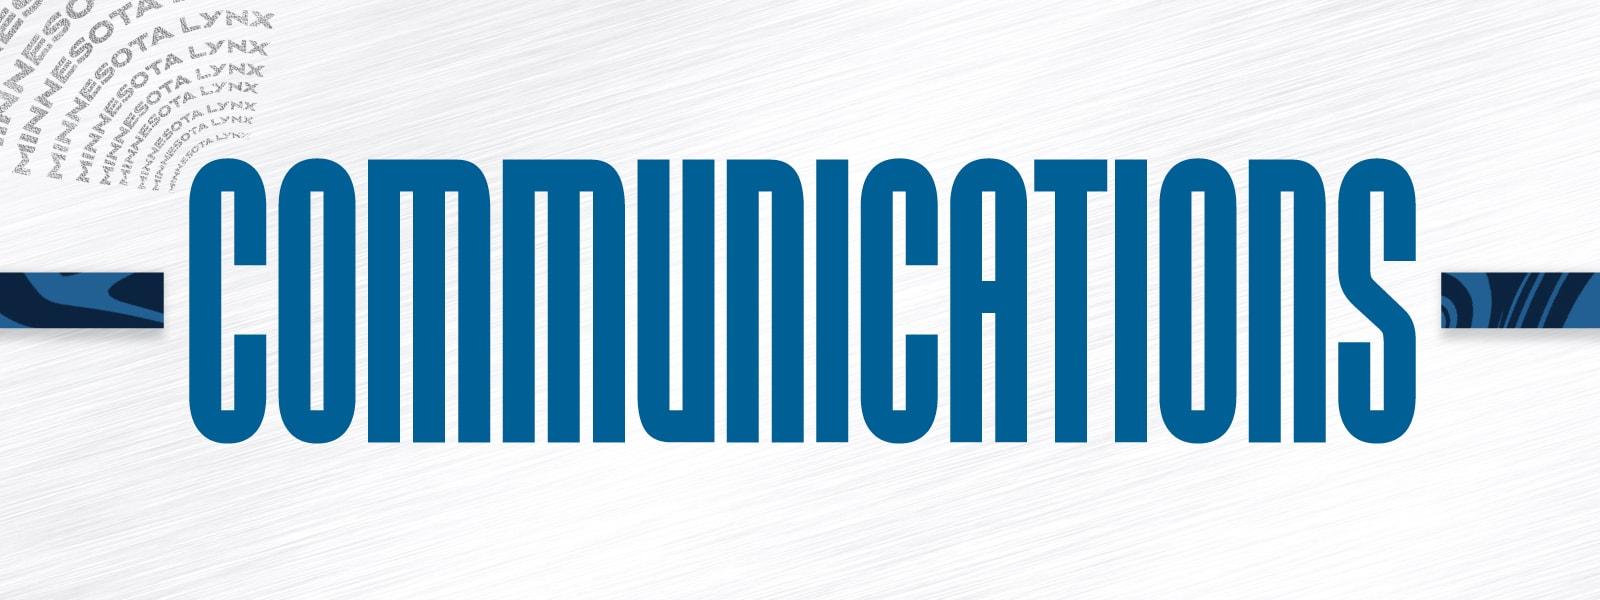 Minnesota Lynx Communications